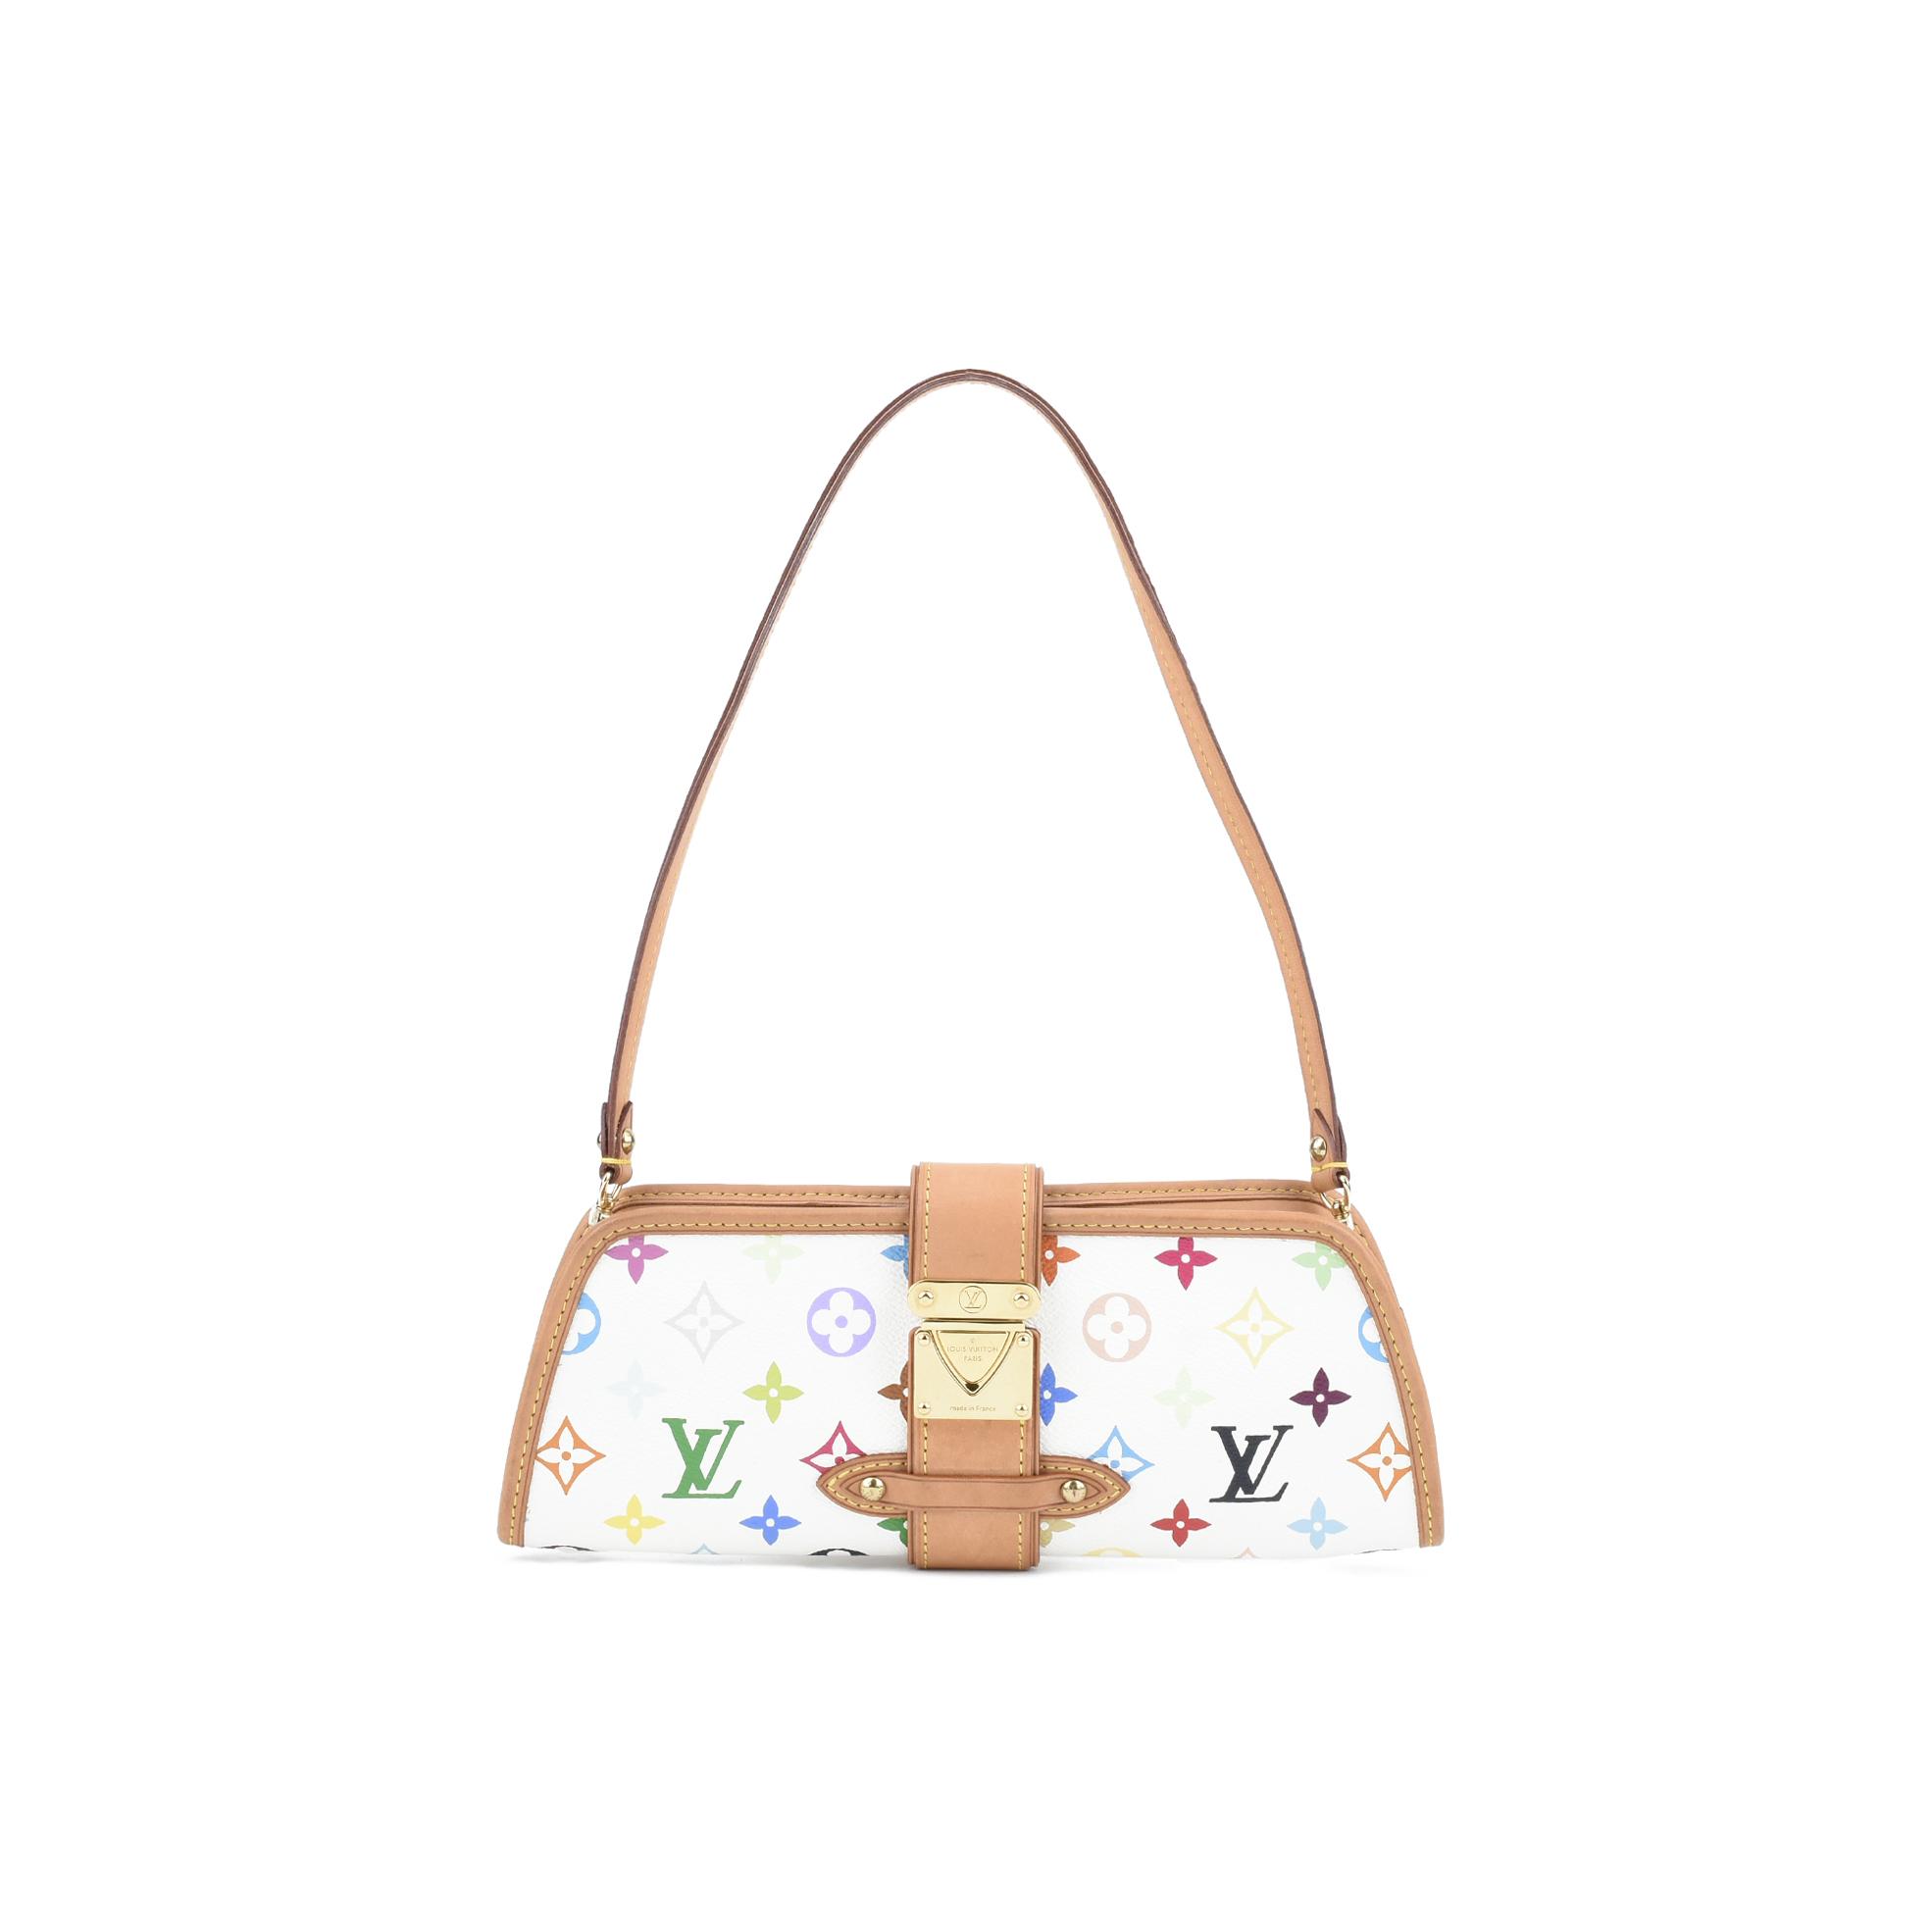 c0b0326fecef Authentic Second Hand Louis Vuitton Shirley Monogram Bag (PSS-420-00018)